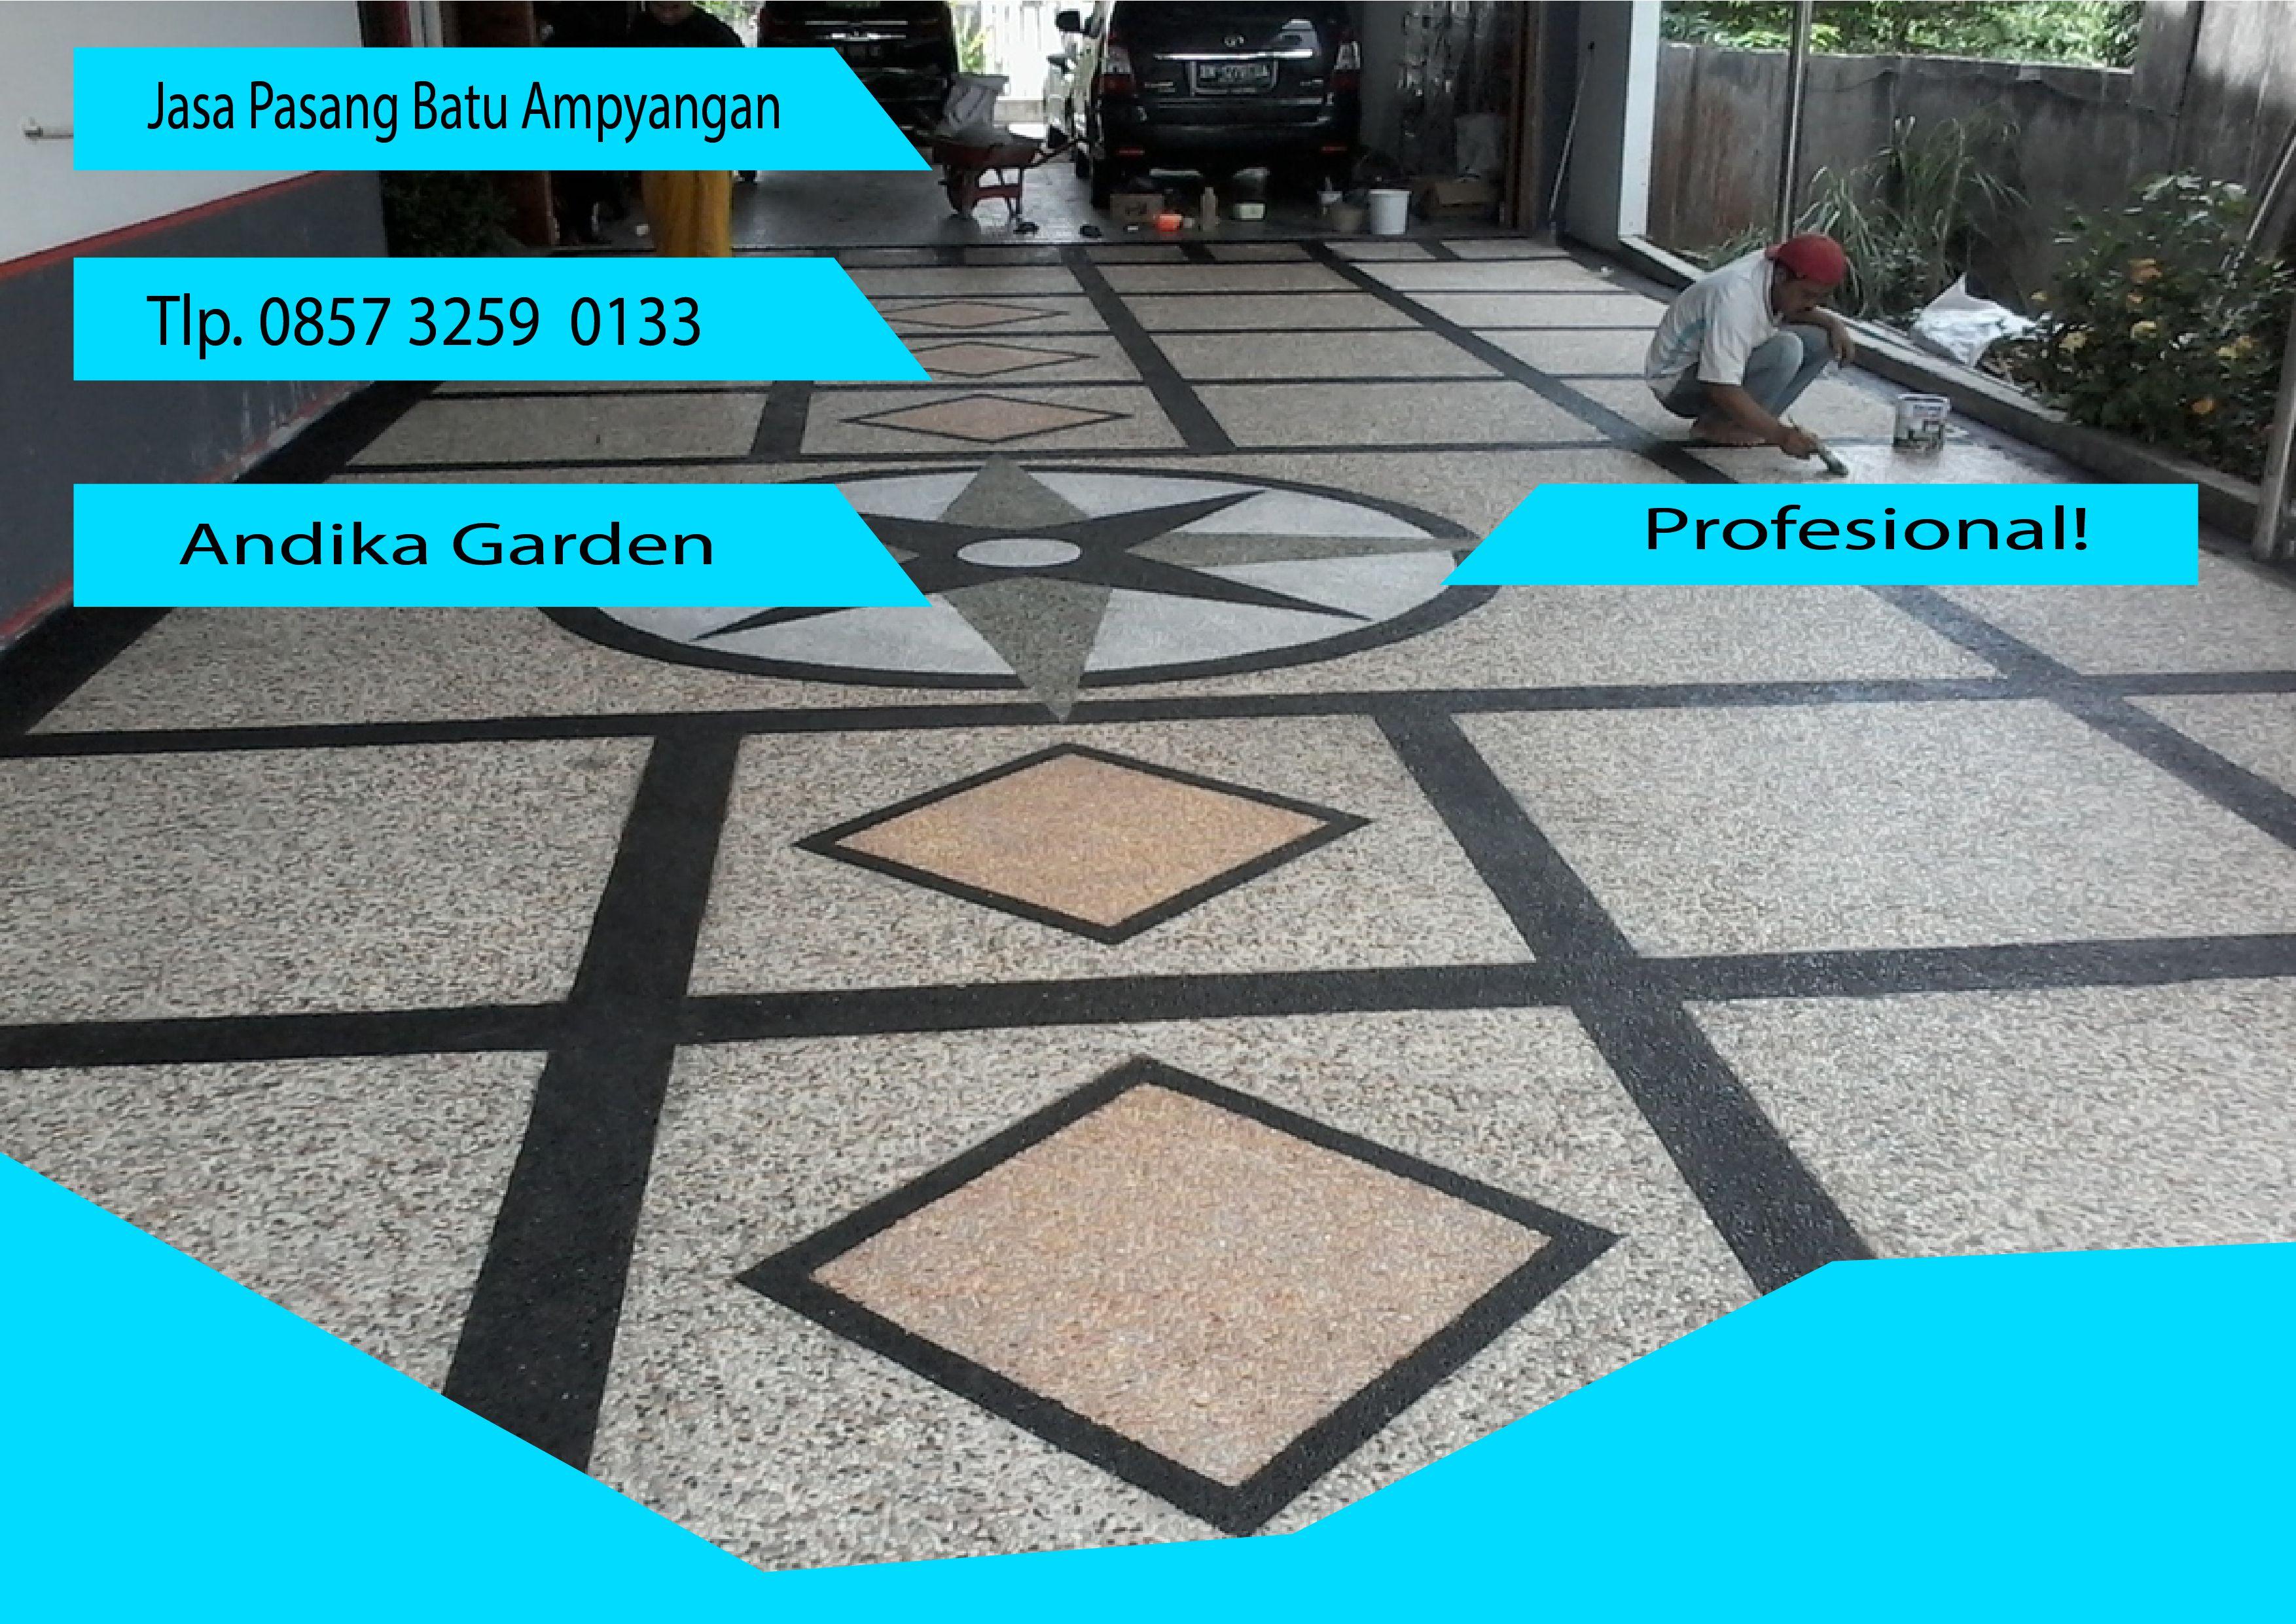 Jasa Cor Lantai Garasi Dengan Batu Alam Call 0857 3259 0133 Andika Garden In 2020 Batu Gresik Batu Alam